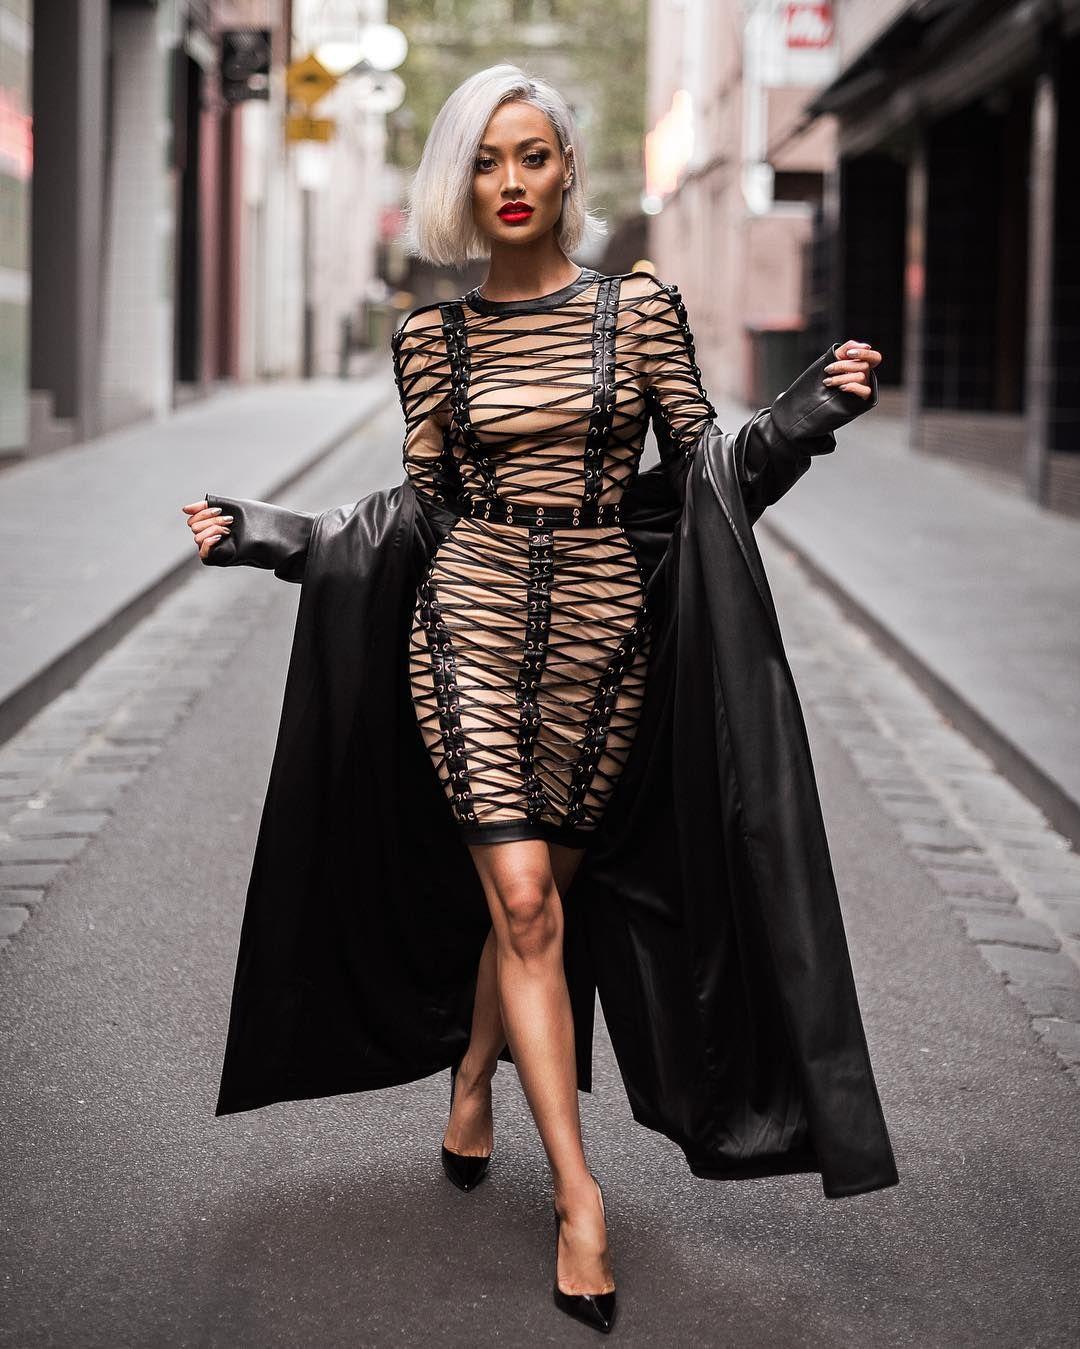 Stunning And Surprising New Looks: #SlickerThanYourAverage Fashion Blogger Aus Mgmt.